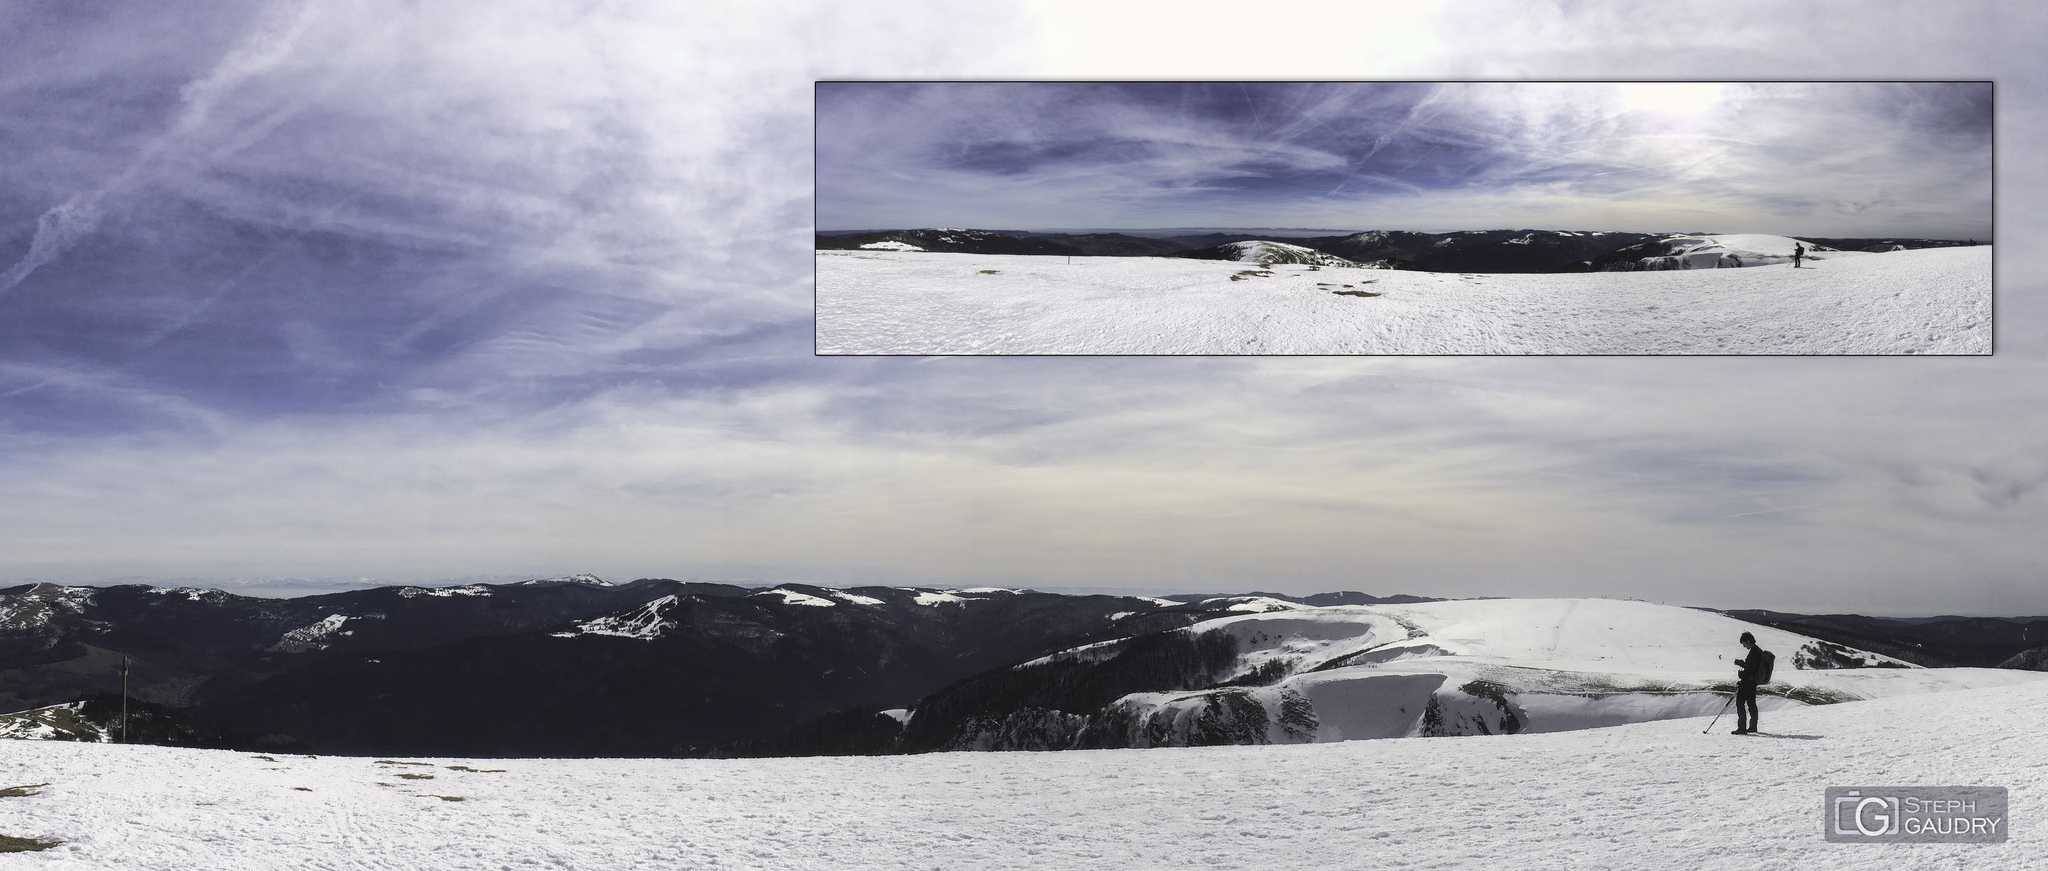 Panorama iPhone - Le Hohneck [Klik om de diavoorstelling te starten]